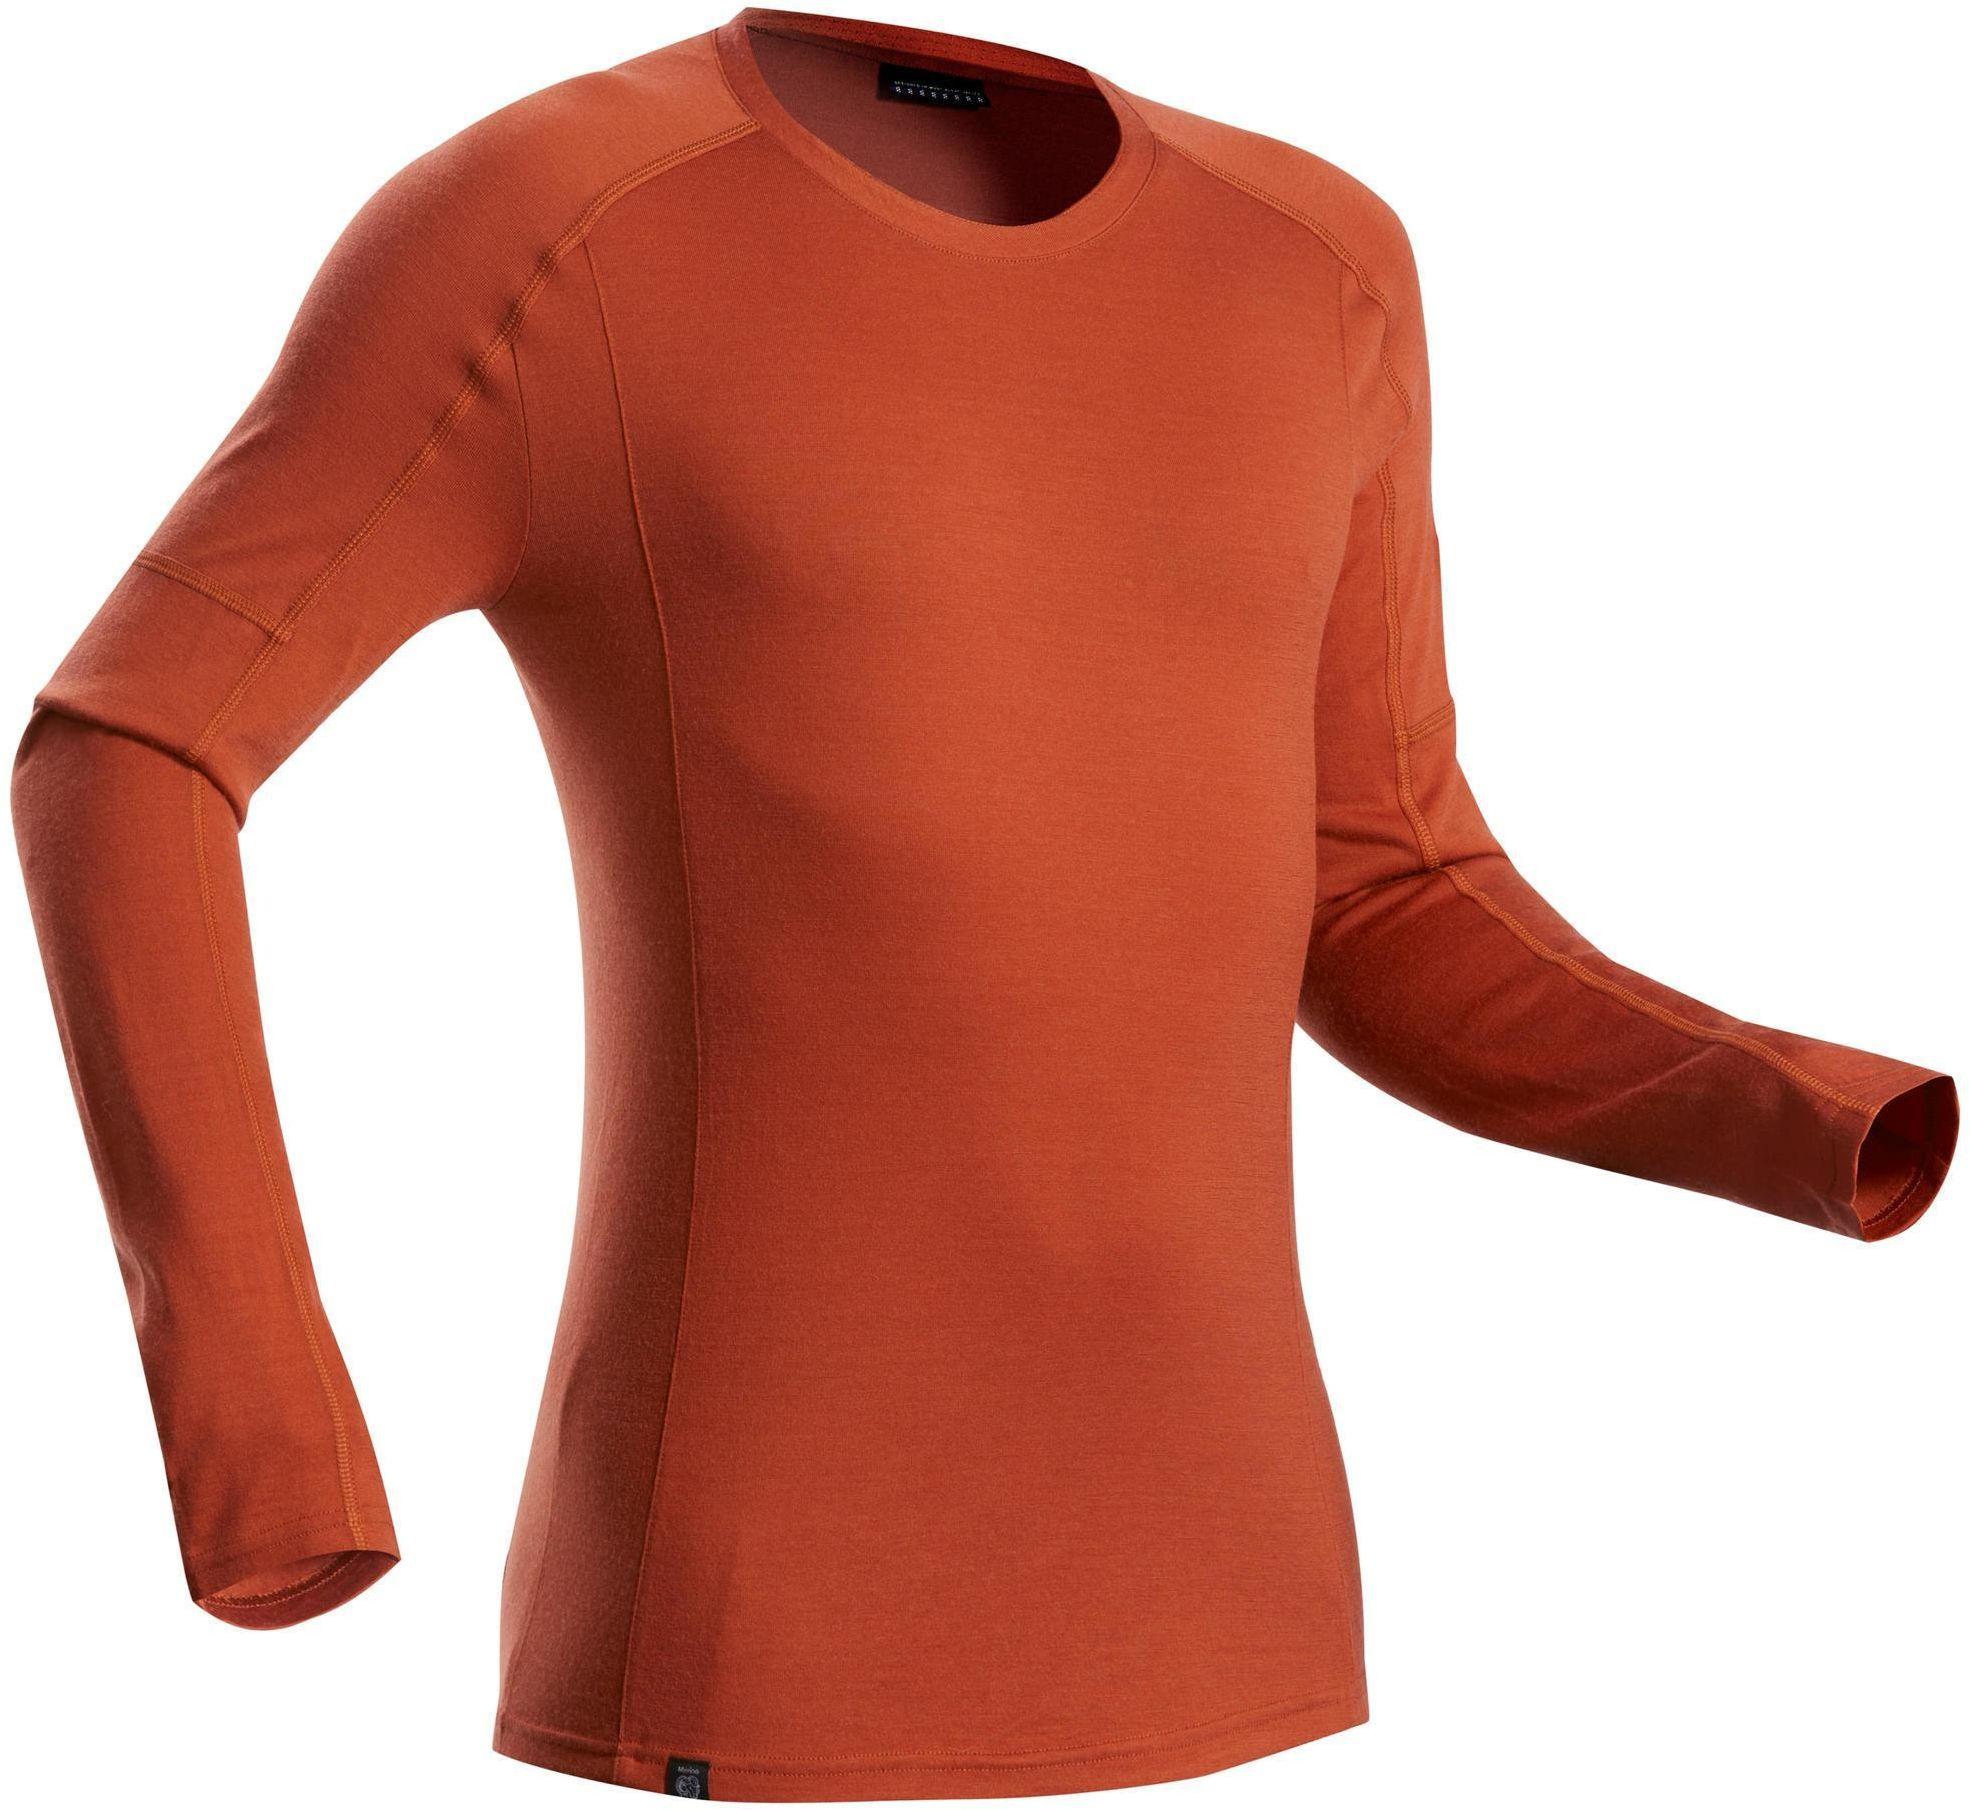 Koszulka trekkingowa z długim rękawem - TREK 500 MERINO - męska